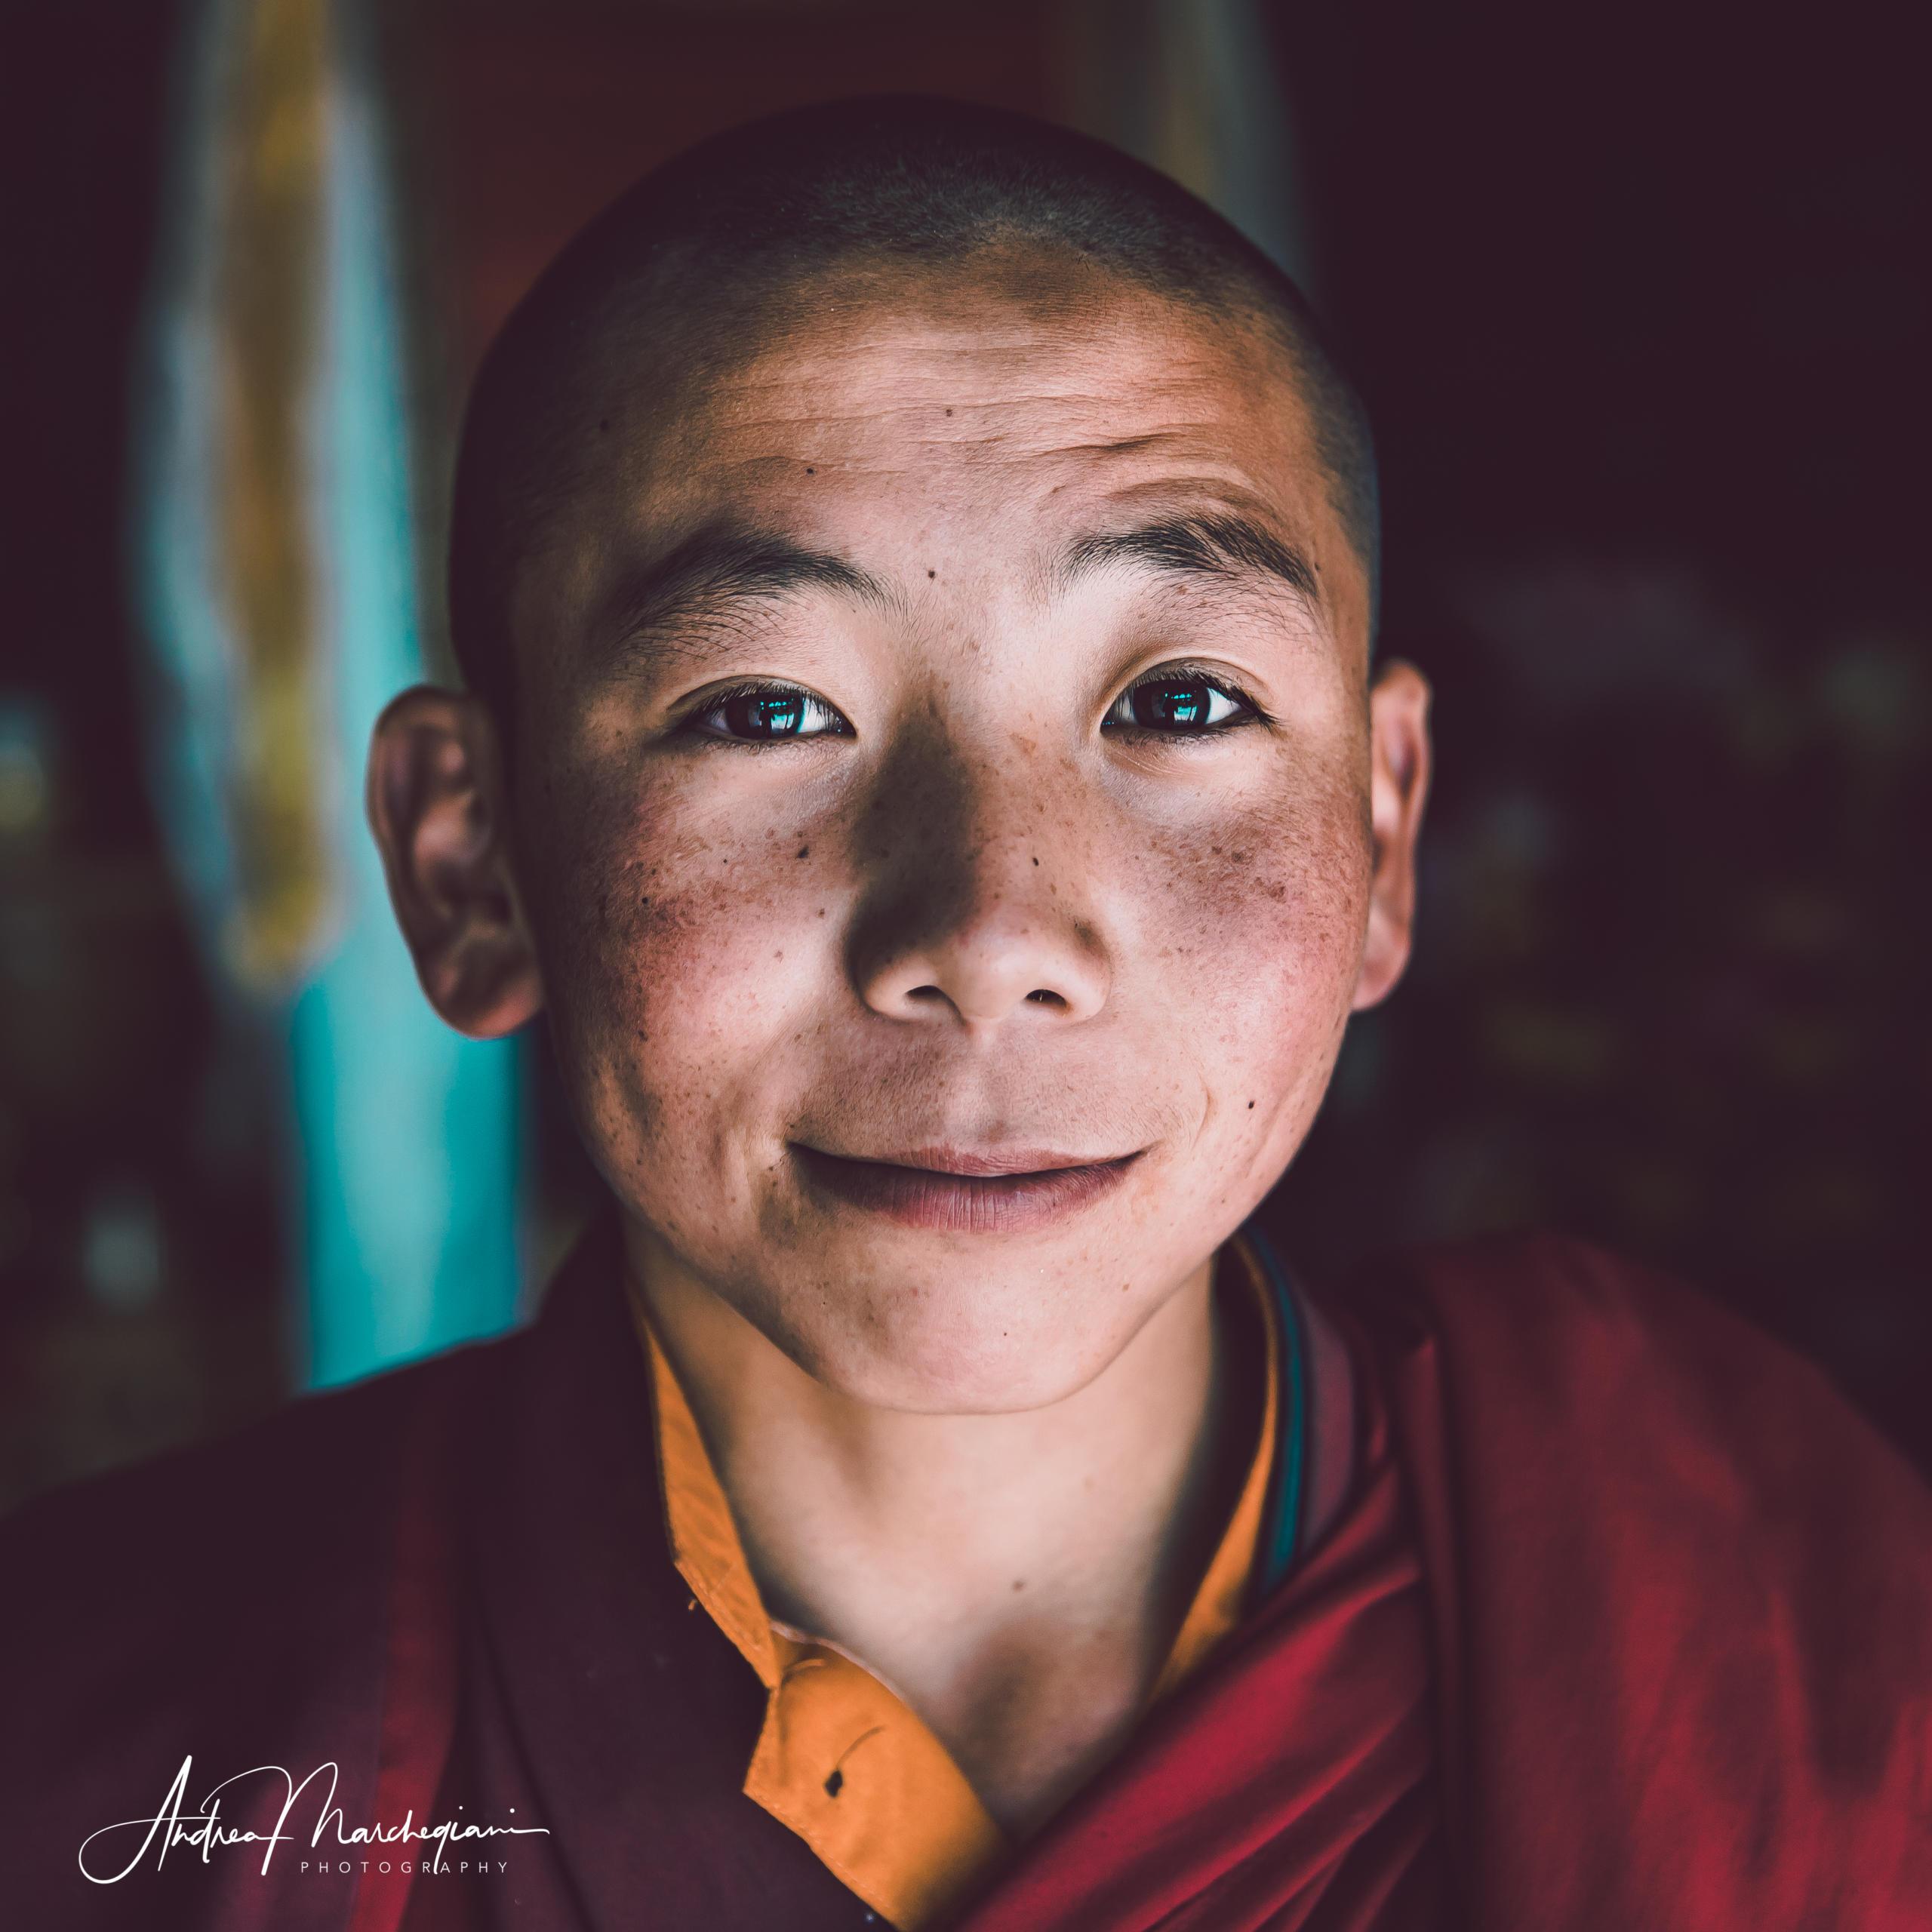 giovane-monaco-tibetano